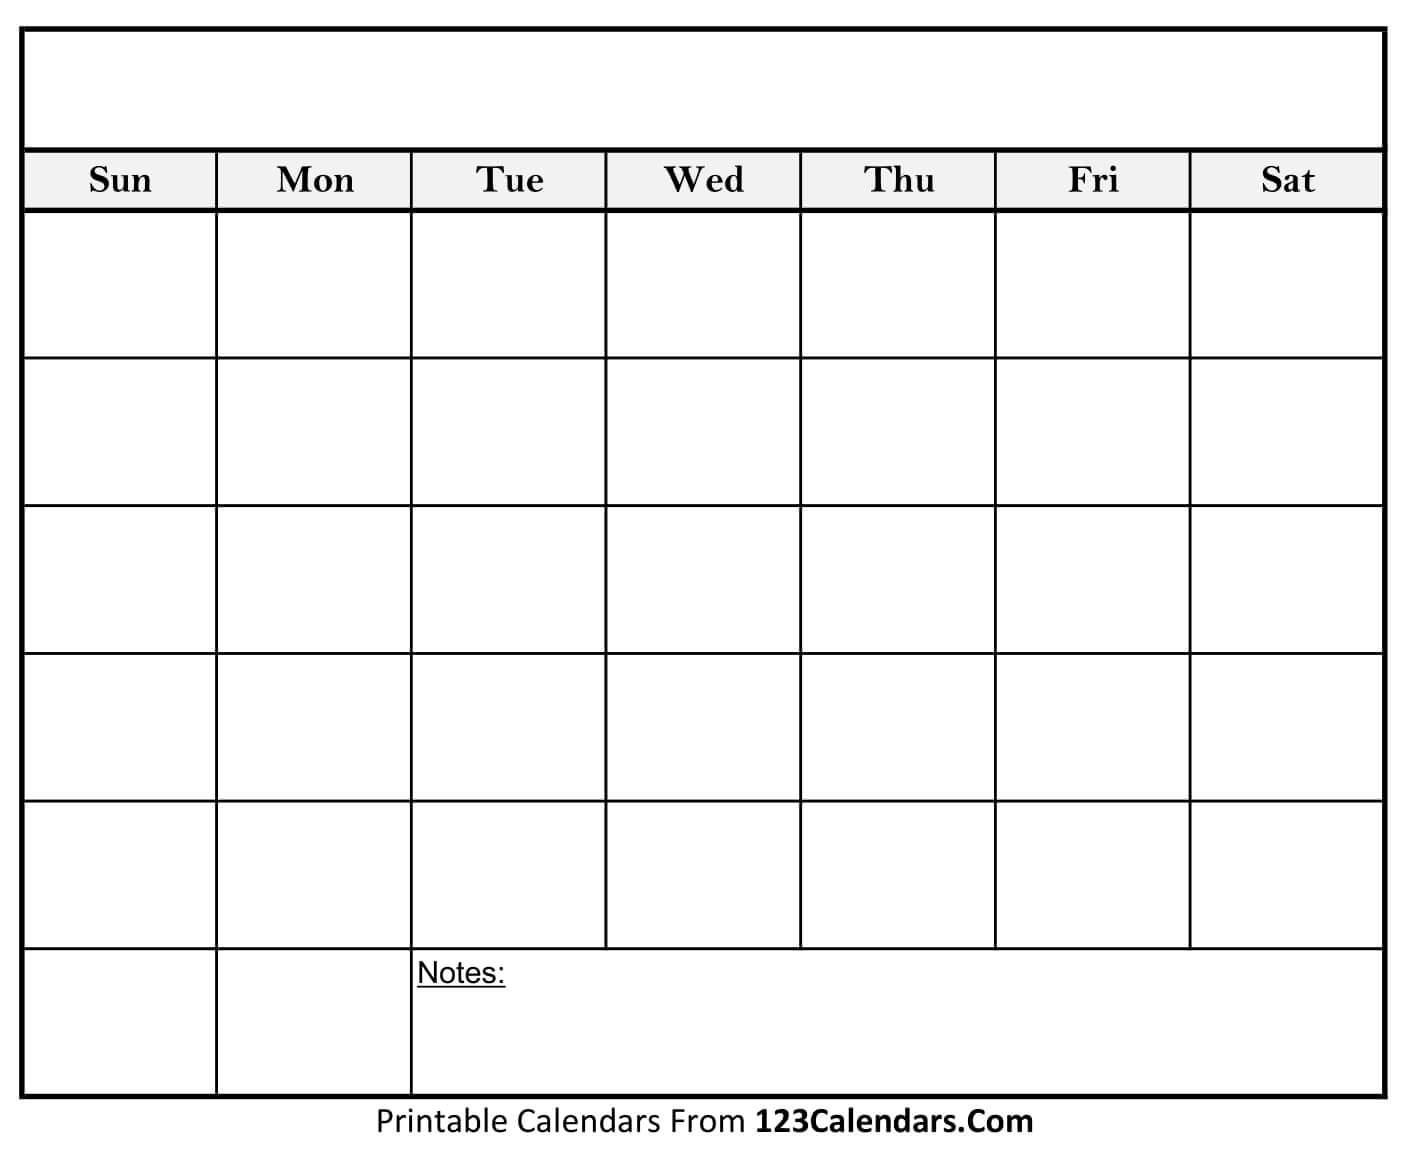 Free Printable Blank Calendar | 123Calendars_A Printable Blank Calendar